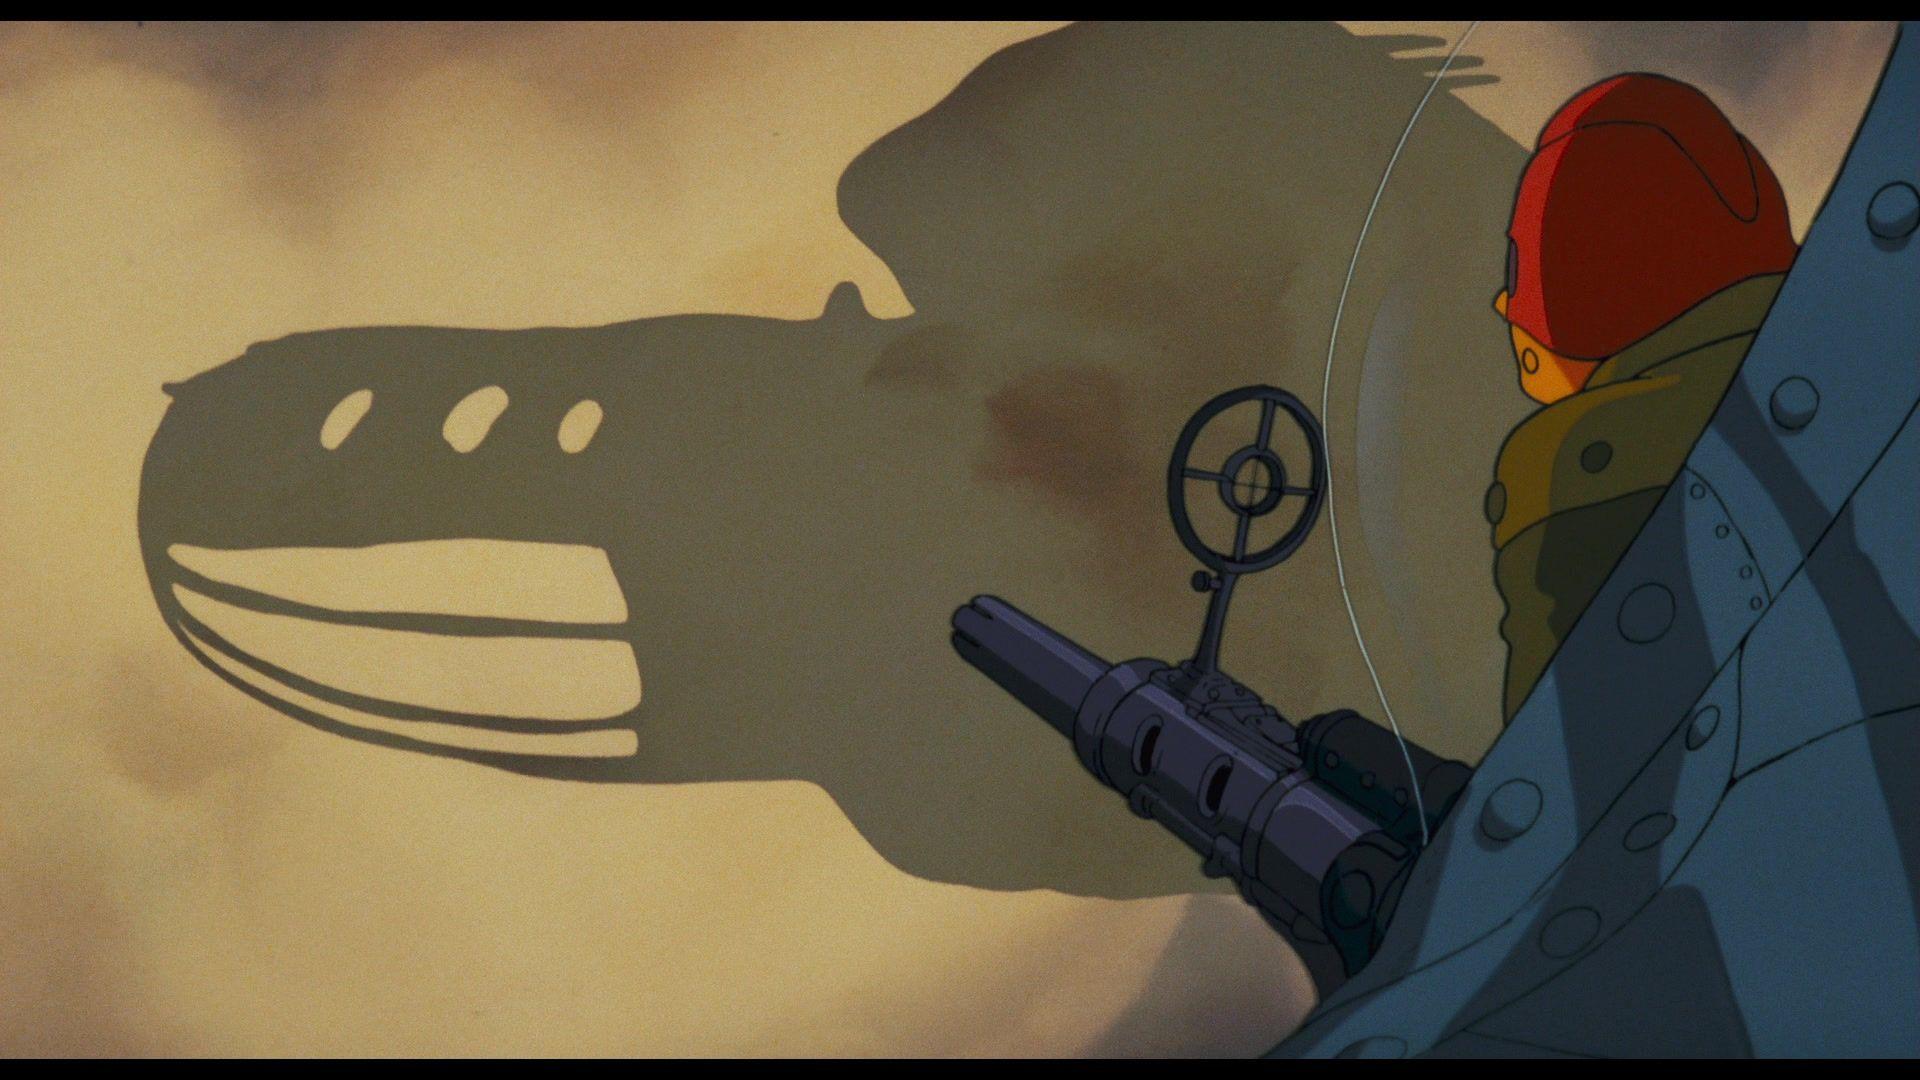 Nausicaa Of The Valley Of The Wind Screencap And Image Fancaps Net 2020 ナウシカ 風の谷のナウシカ シカ